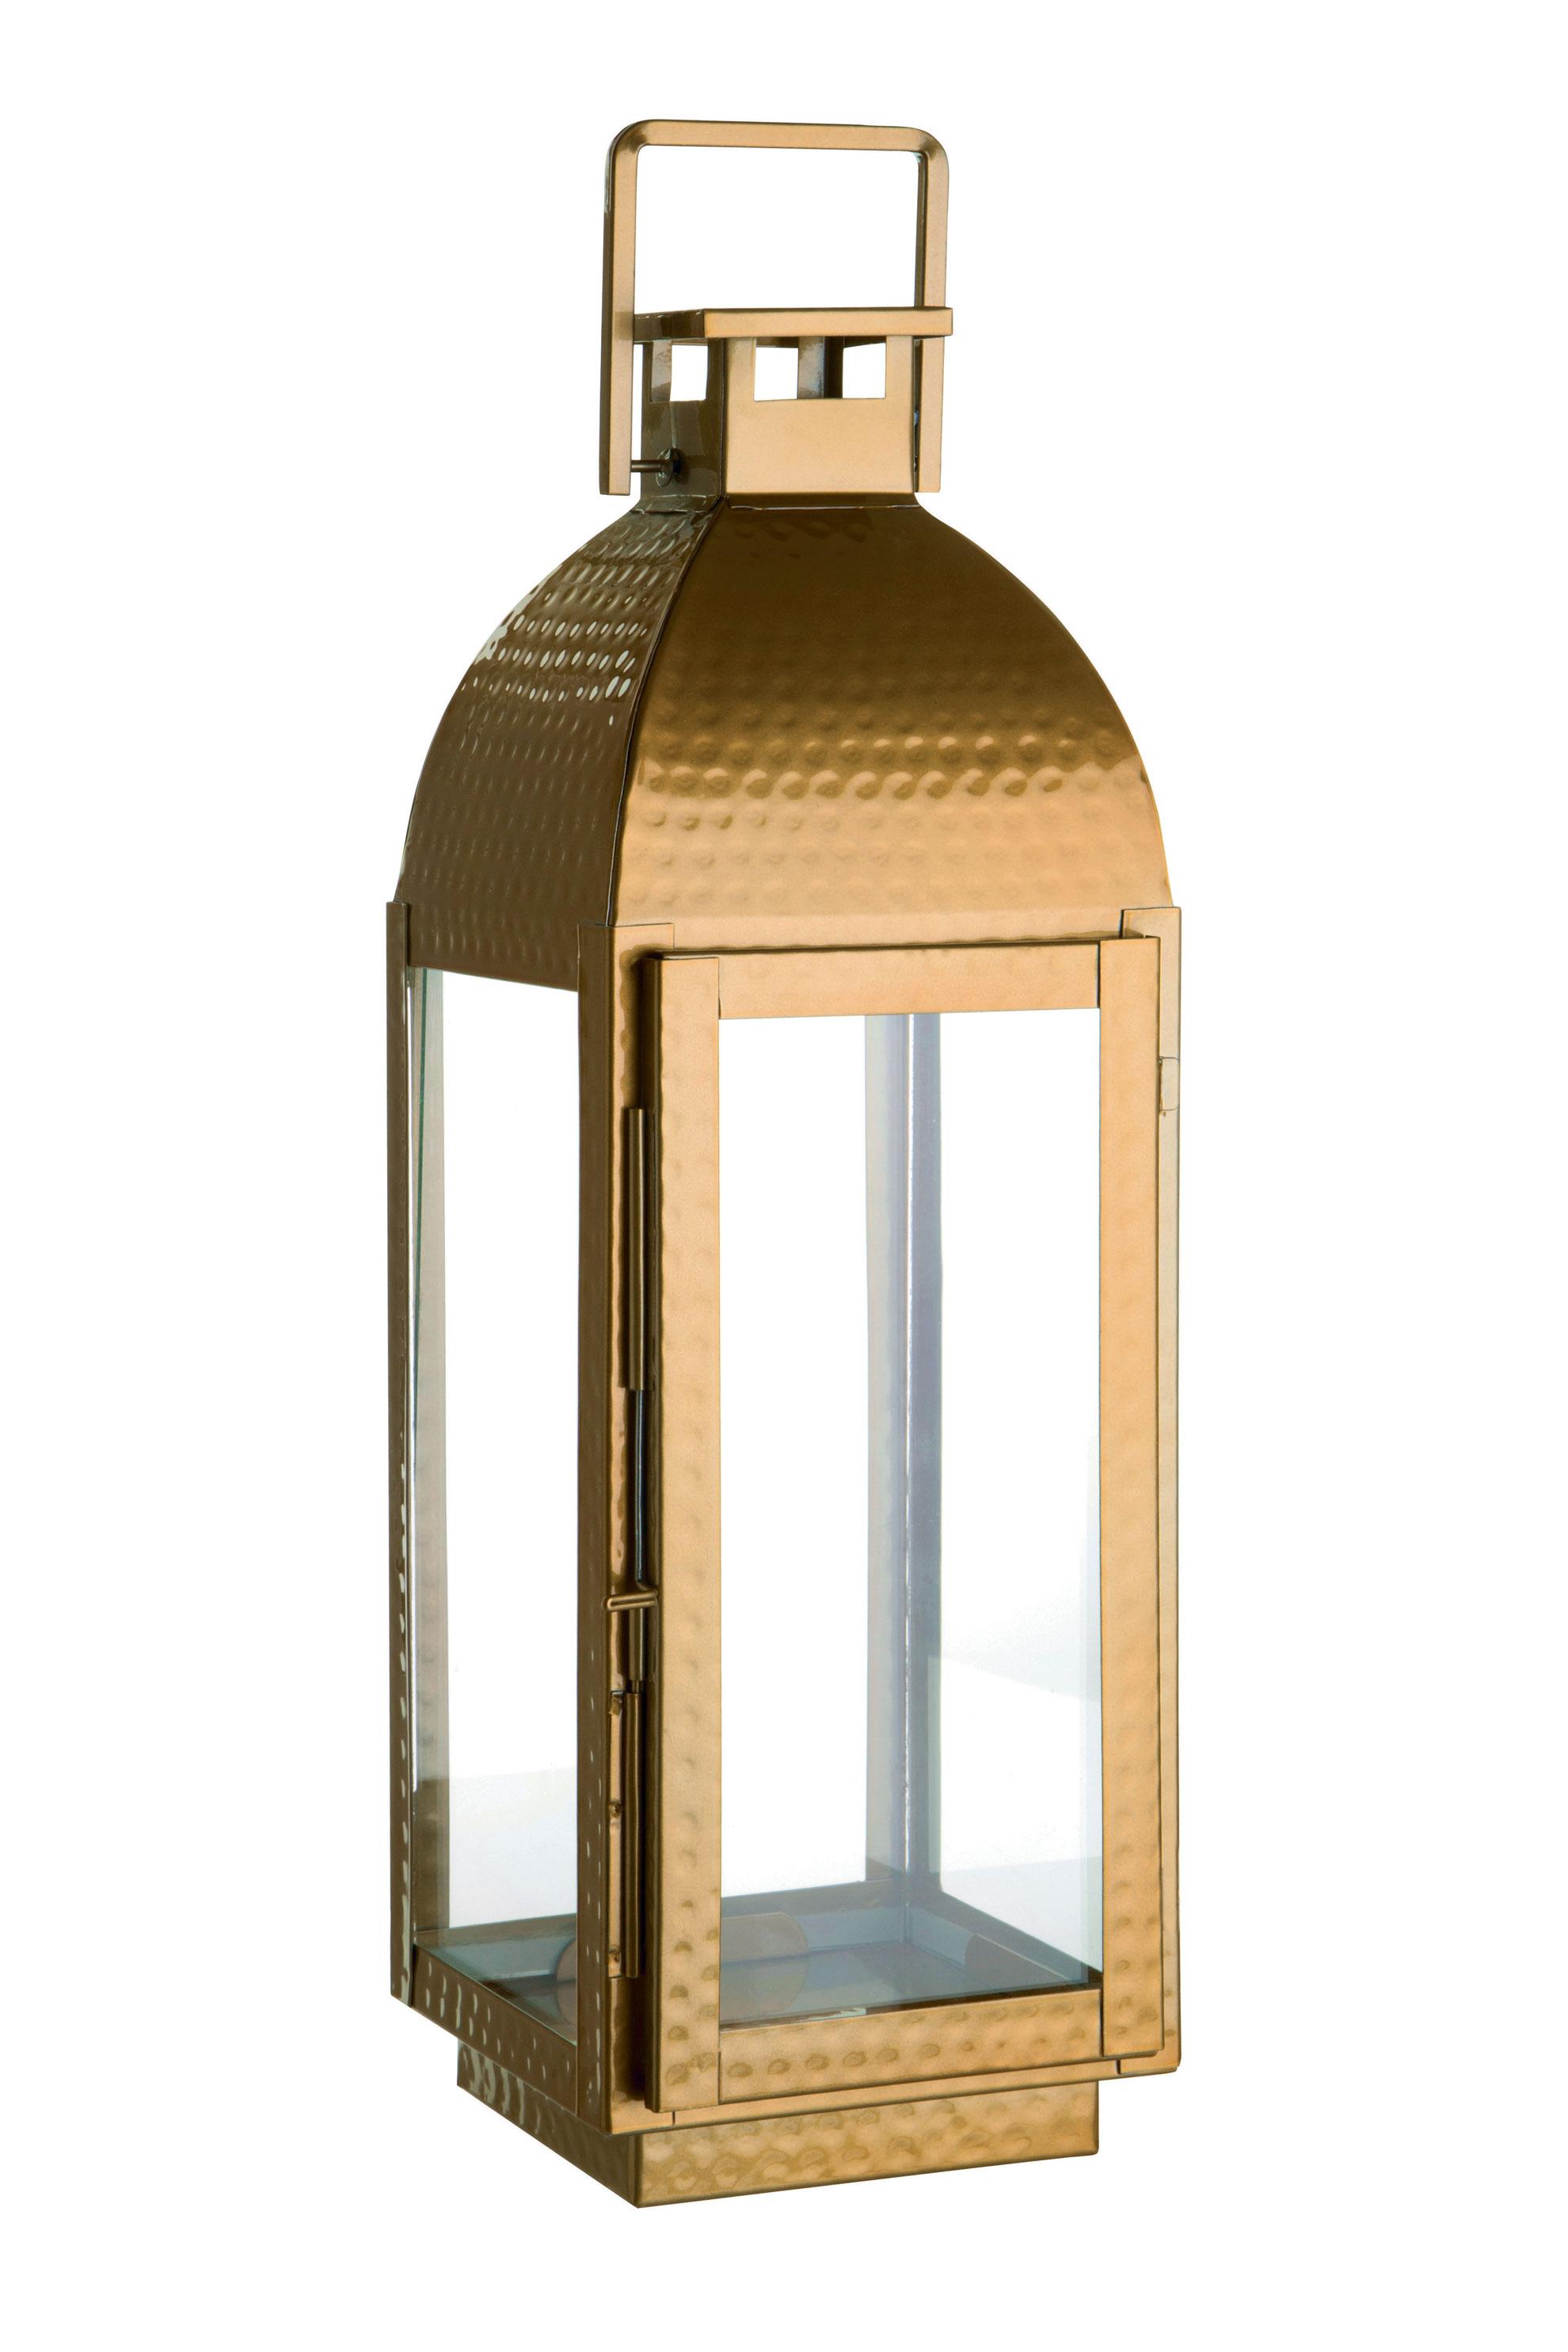 Beautiful Glass Brass Stainless Steel Lantern Candle Tall Thin Holder Fireplace Ebay